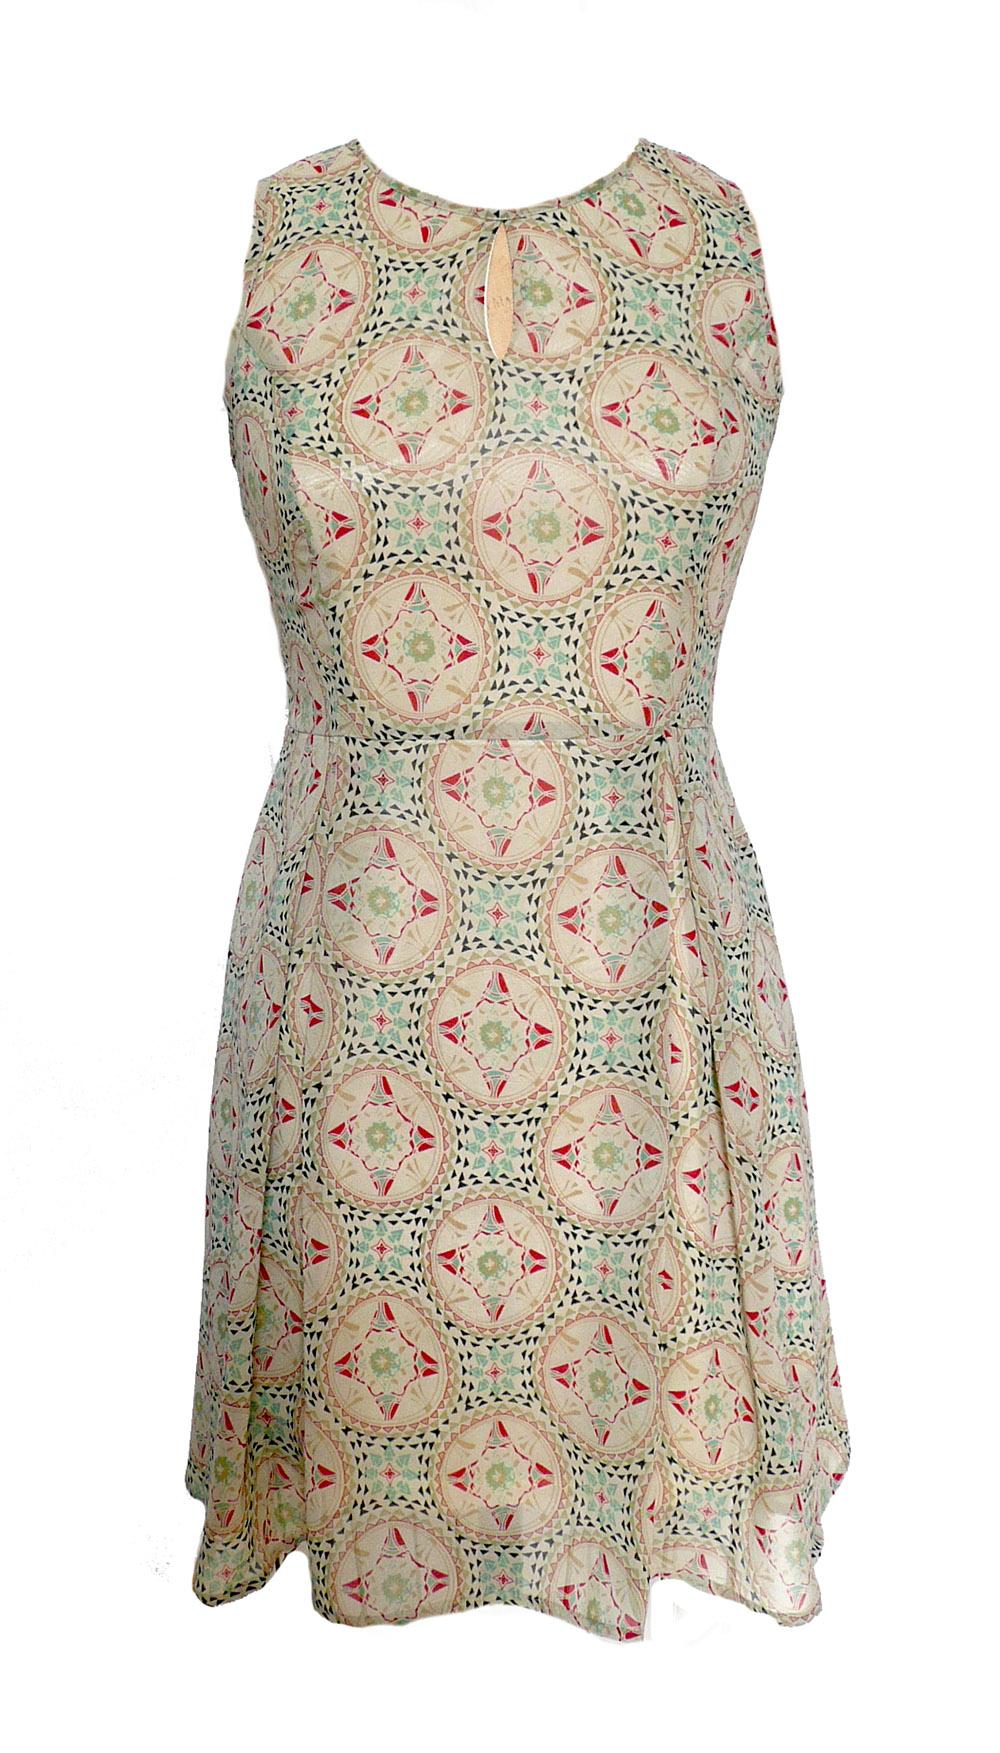 dress vintage prnt.jpg